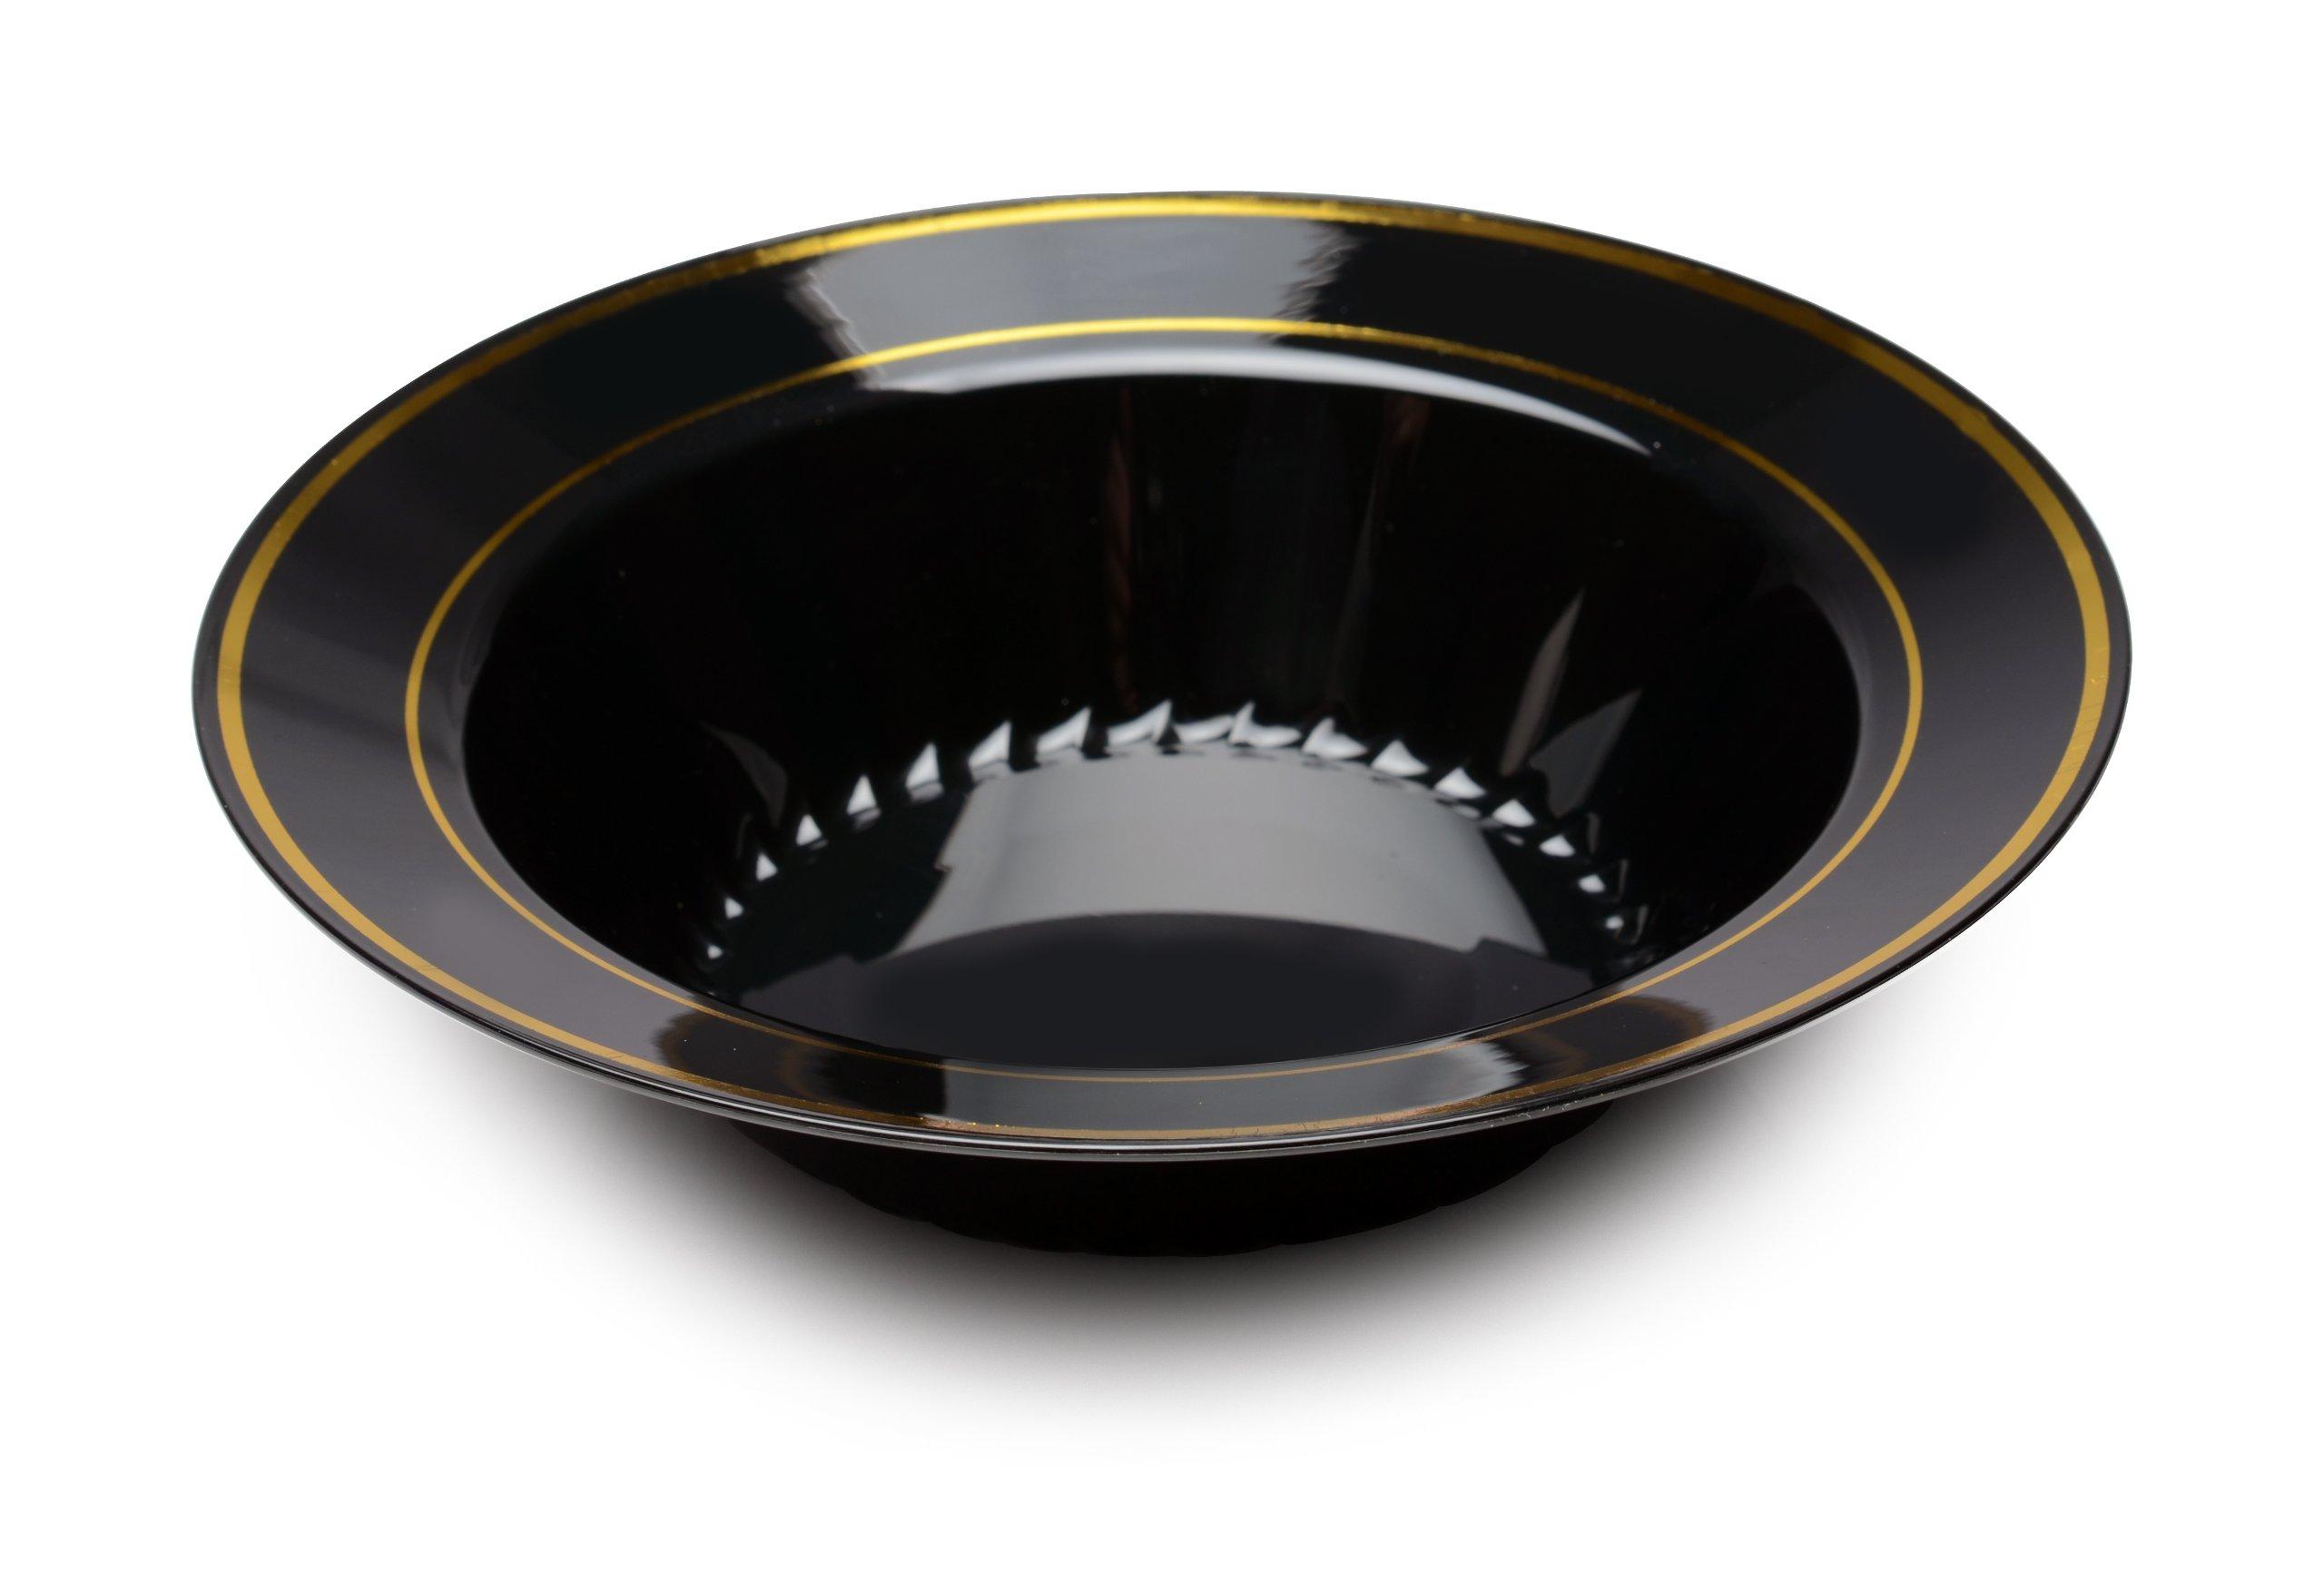 Fineline 12 oz Silver Splendor Bowl (Case of 150) (15 x 10), Black/Gold